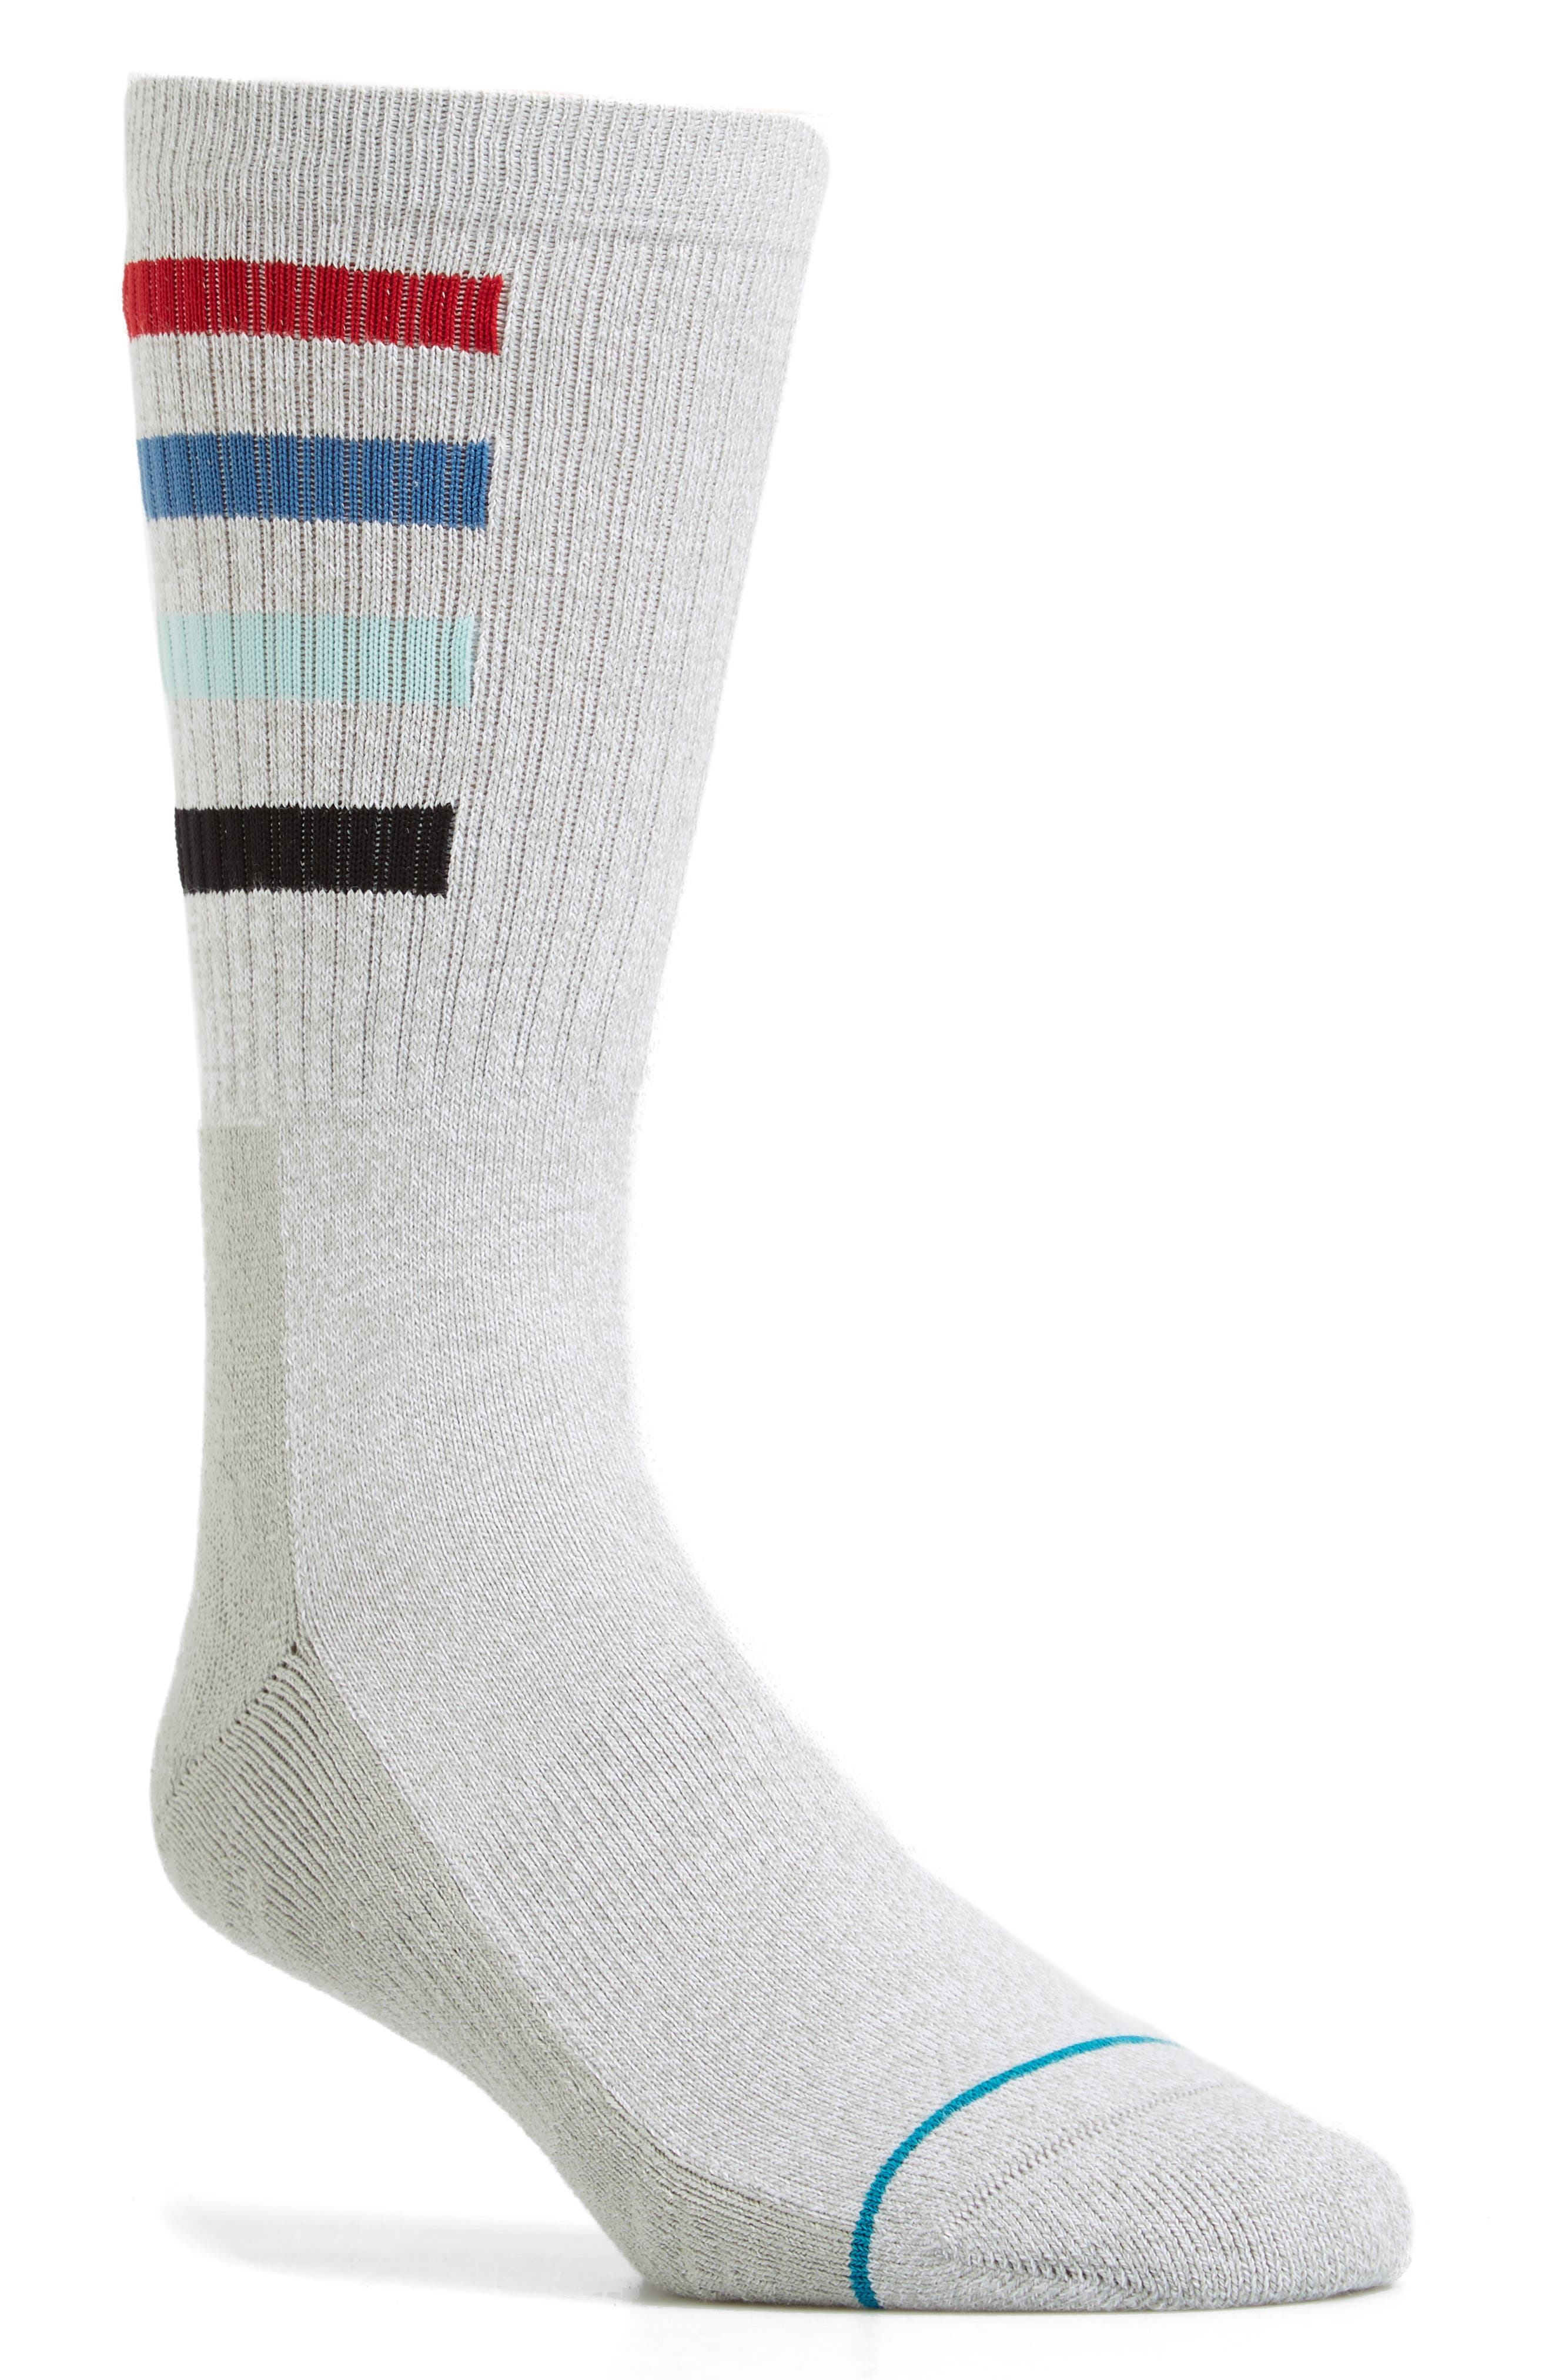 Main Image - Stance Croton Crew Socks